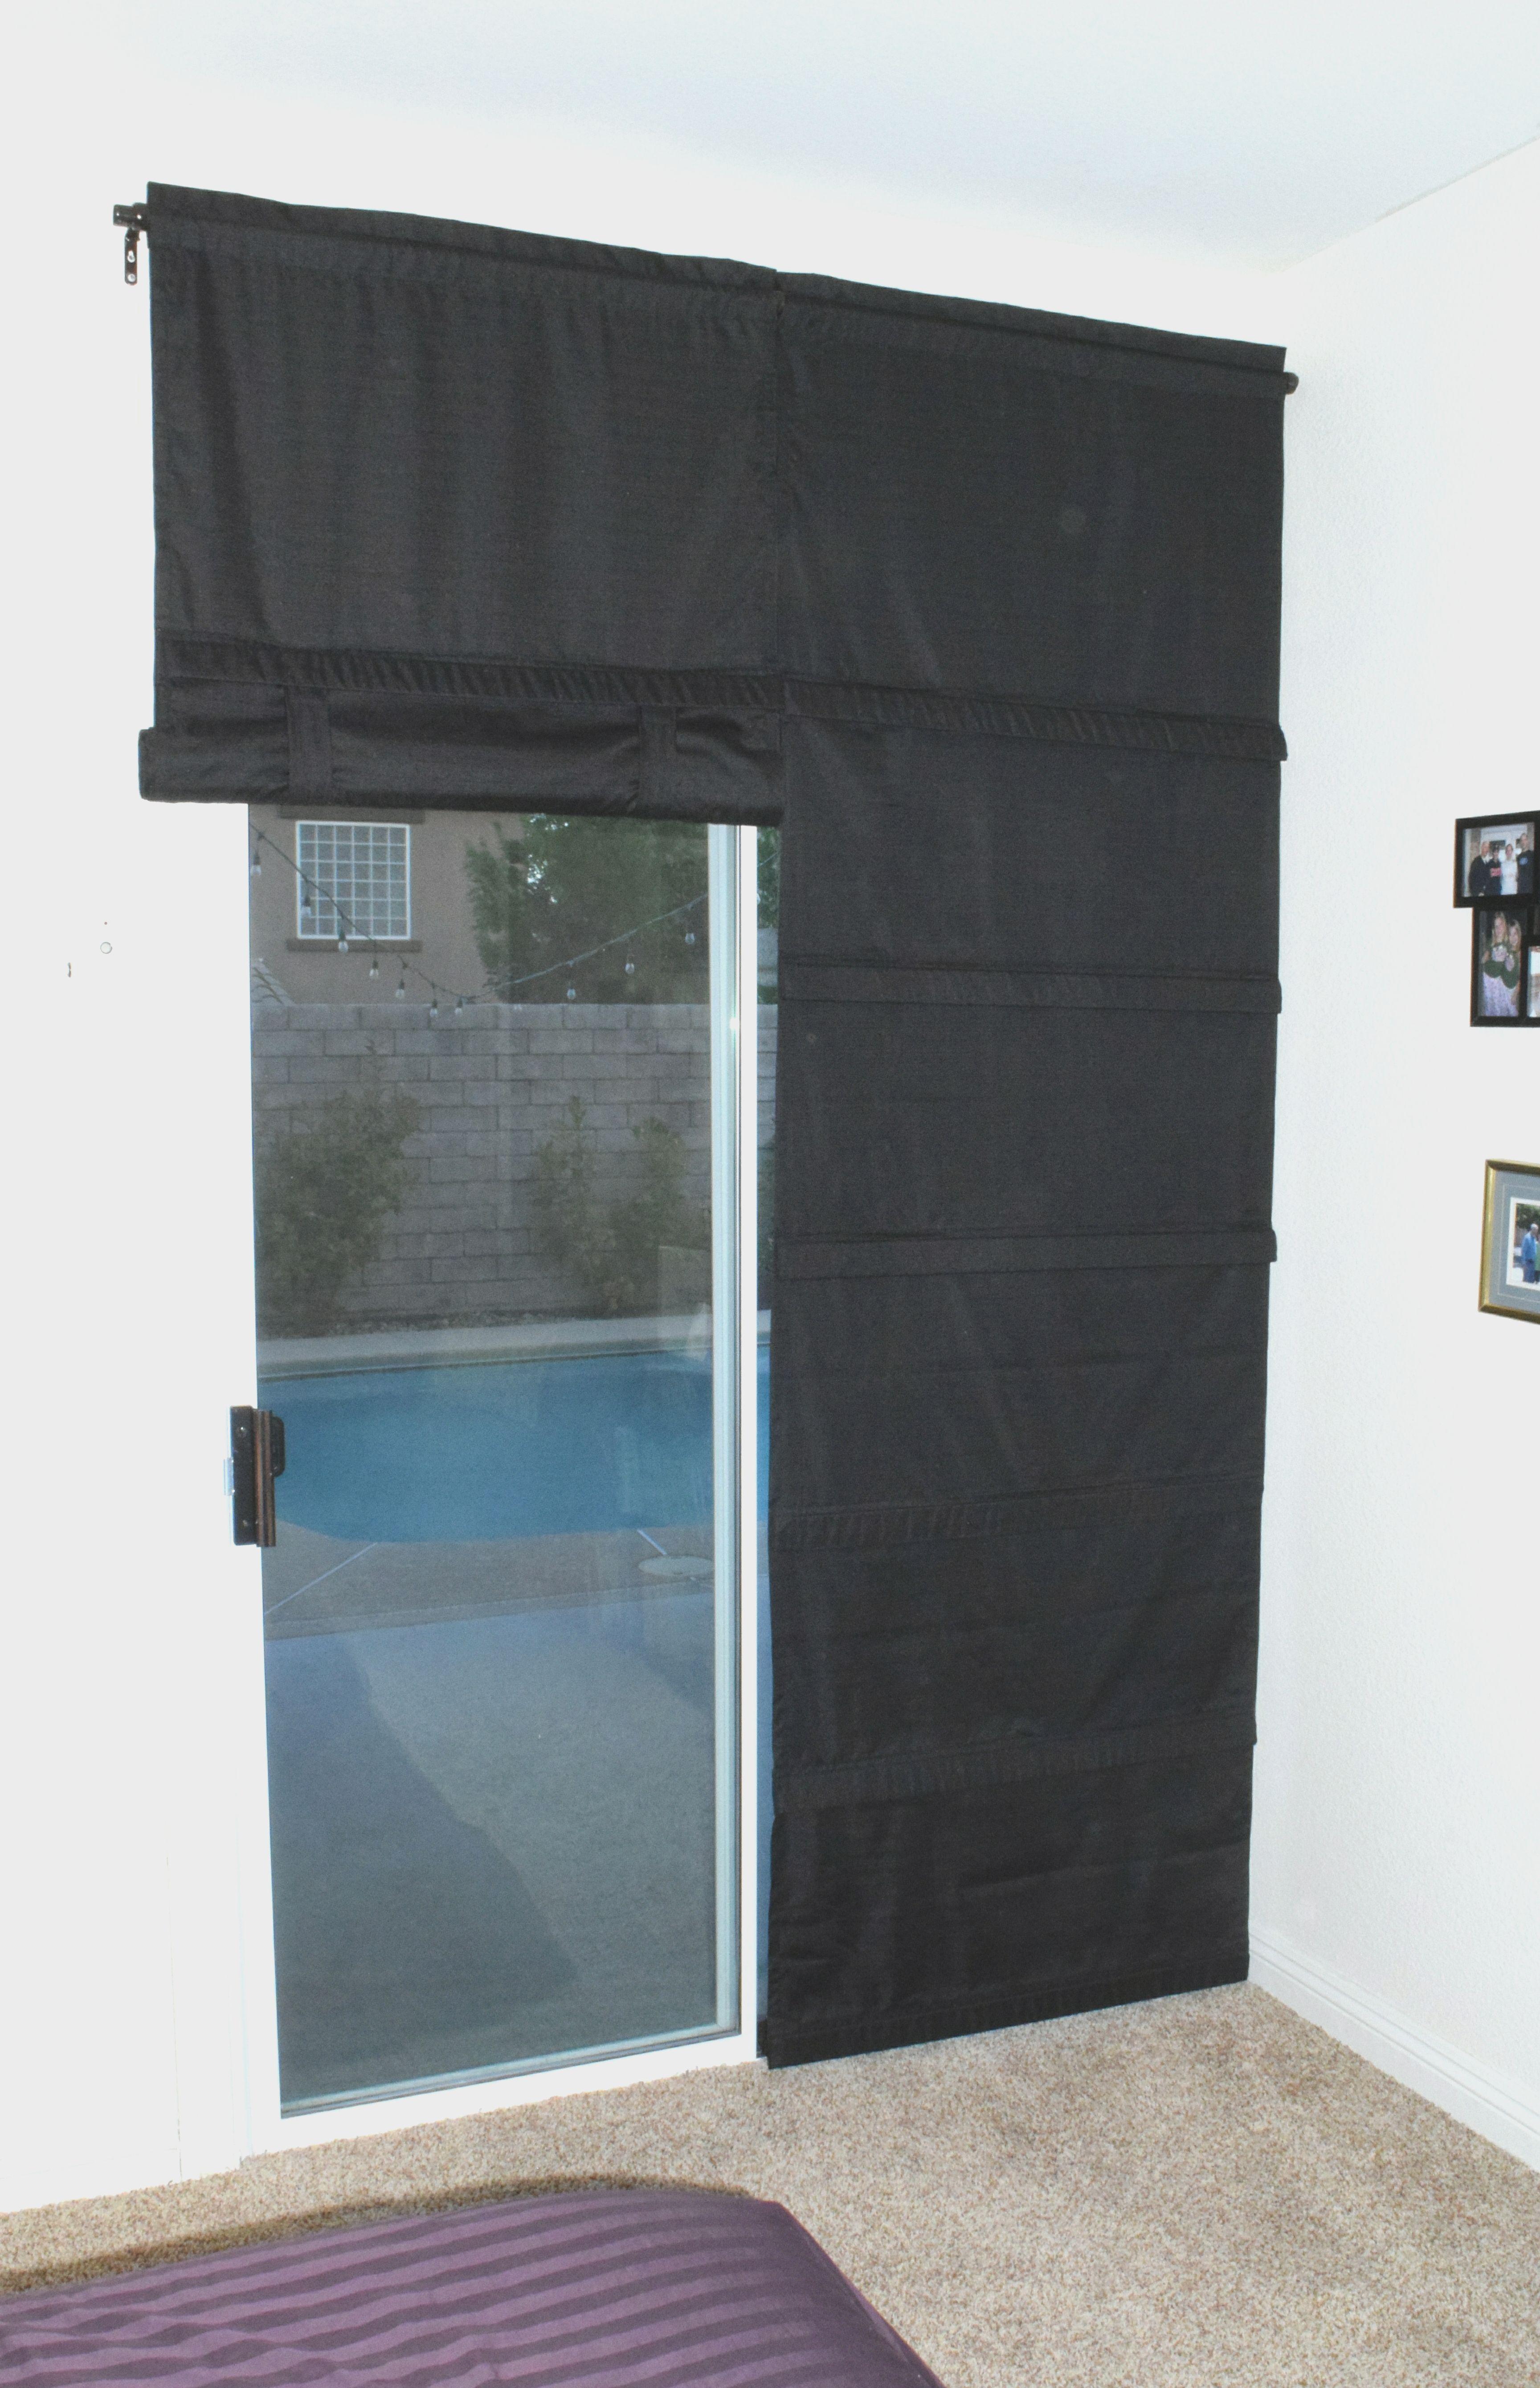 Black Blackout Sliding Glass Door Curtain Shade Price Is Per Panel Sliding Glass Door Sliding Glass Door Curtains Sliding Glass Door Window